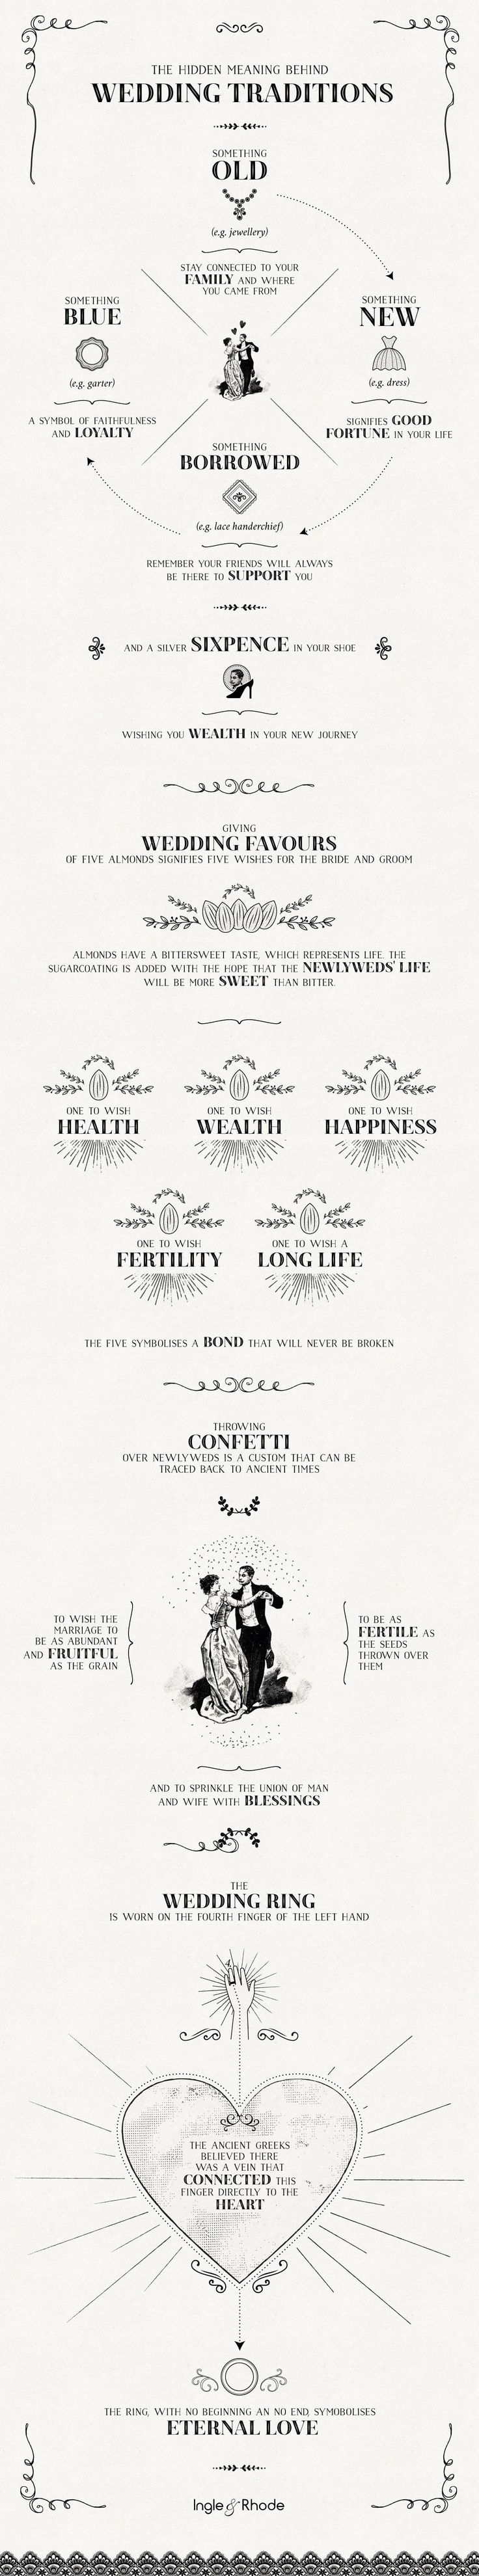 The hidden meaning behind wedding traditions #weddingdaytips